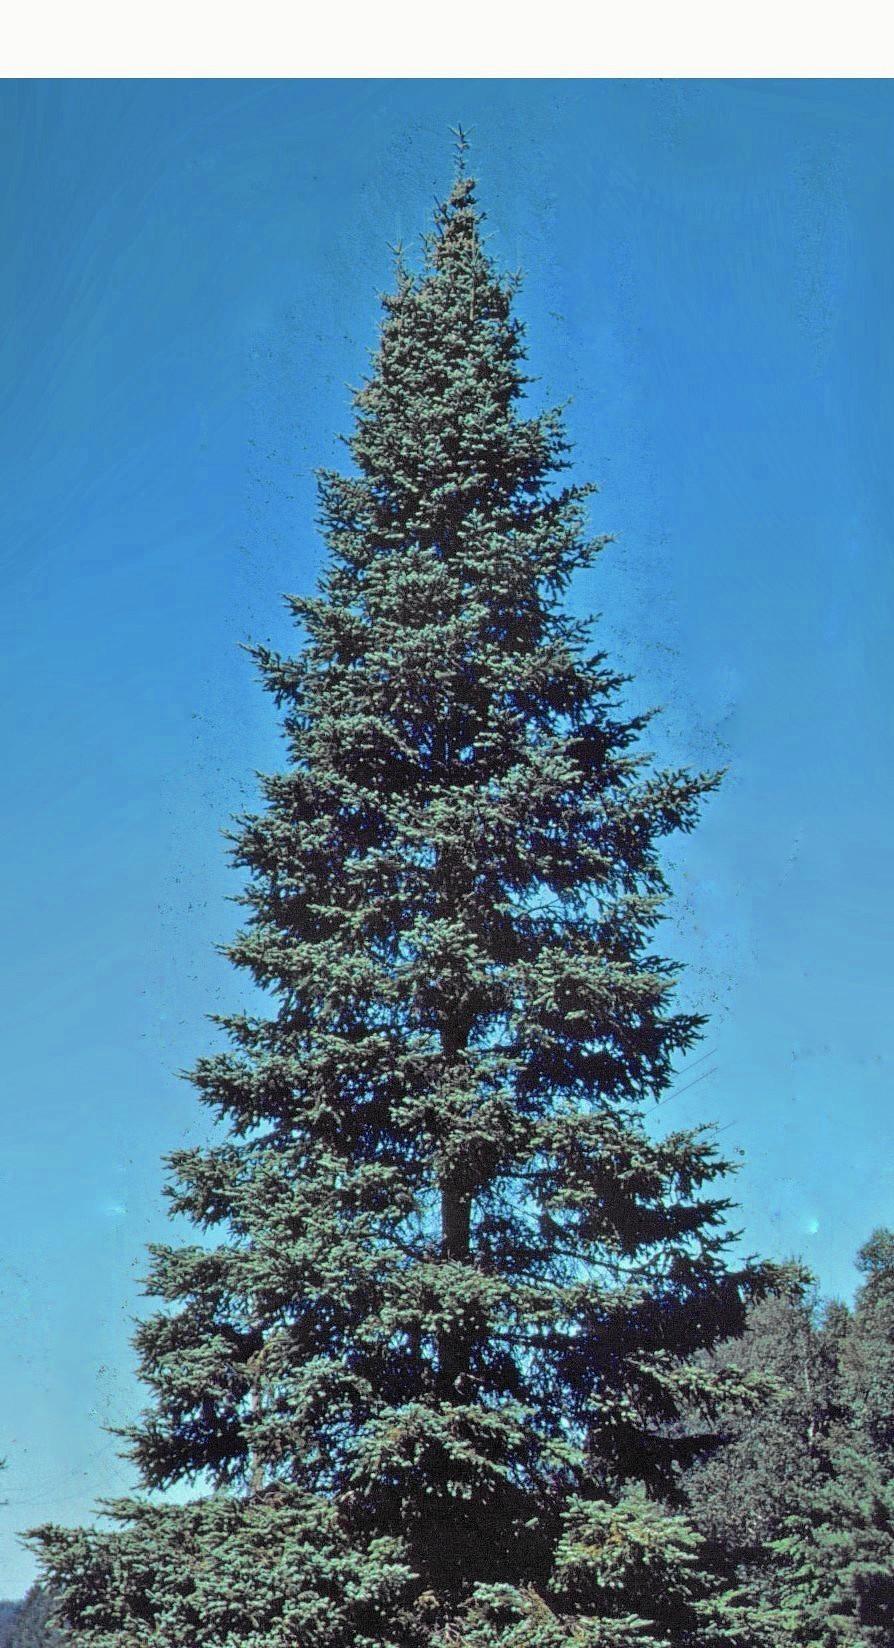 Christmas tree's iconic shape a nod to Germany's influence ...